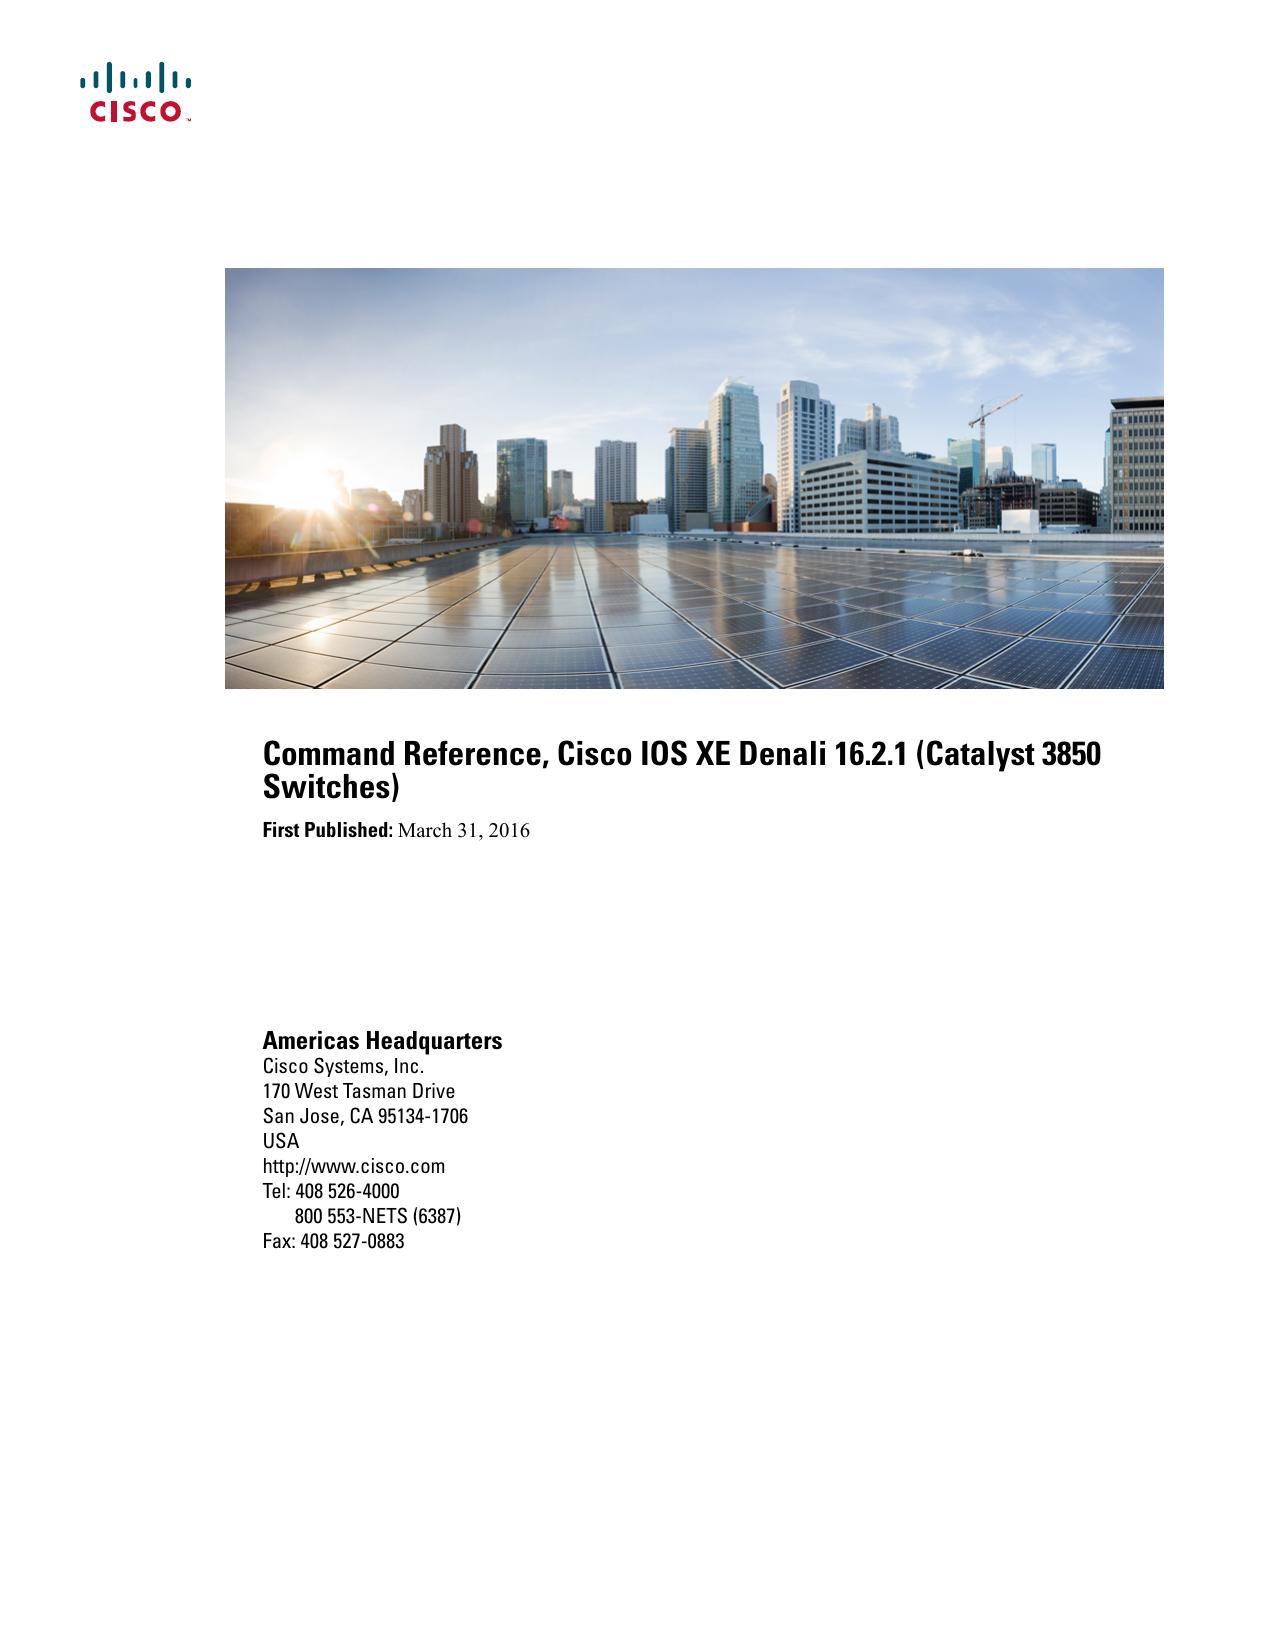 Command Reference, Cisco IOS XE Denali 16 2 1 (Catalyst 3850